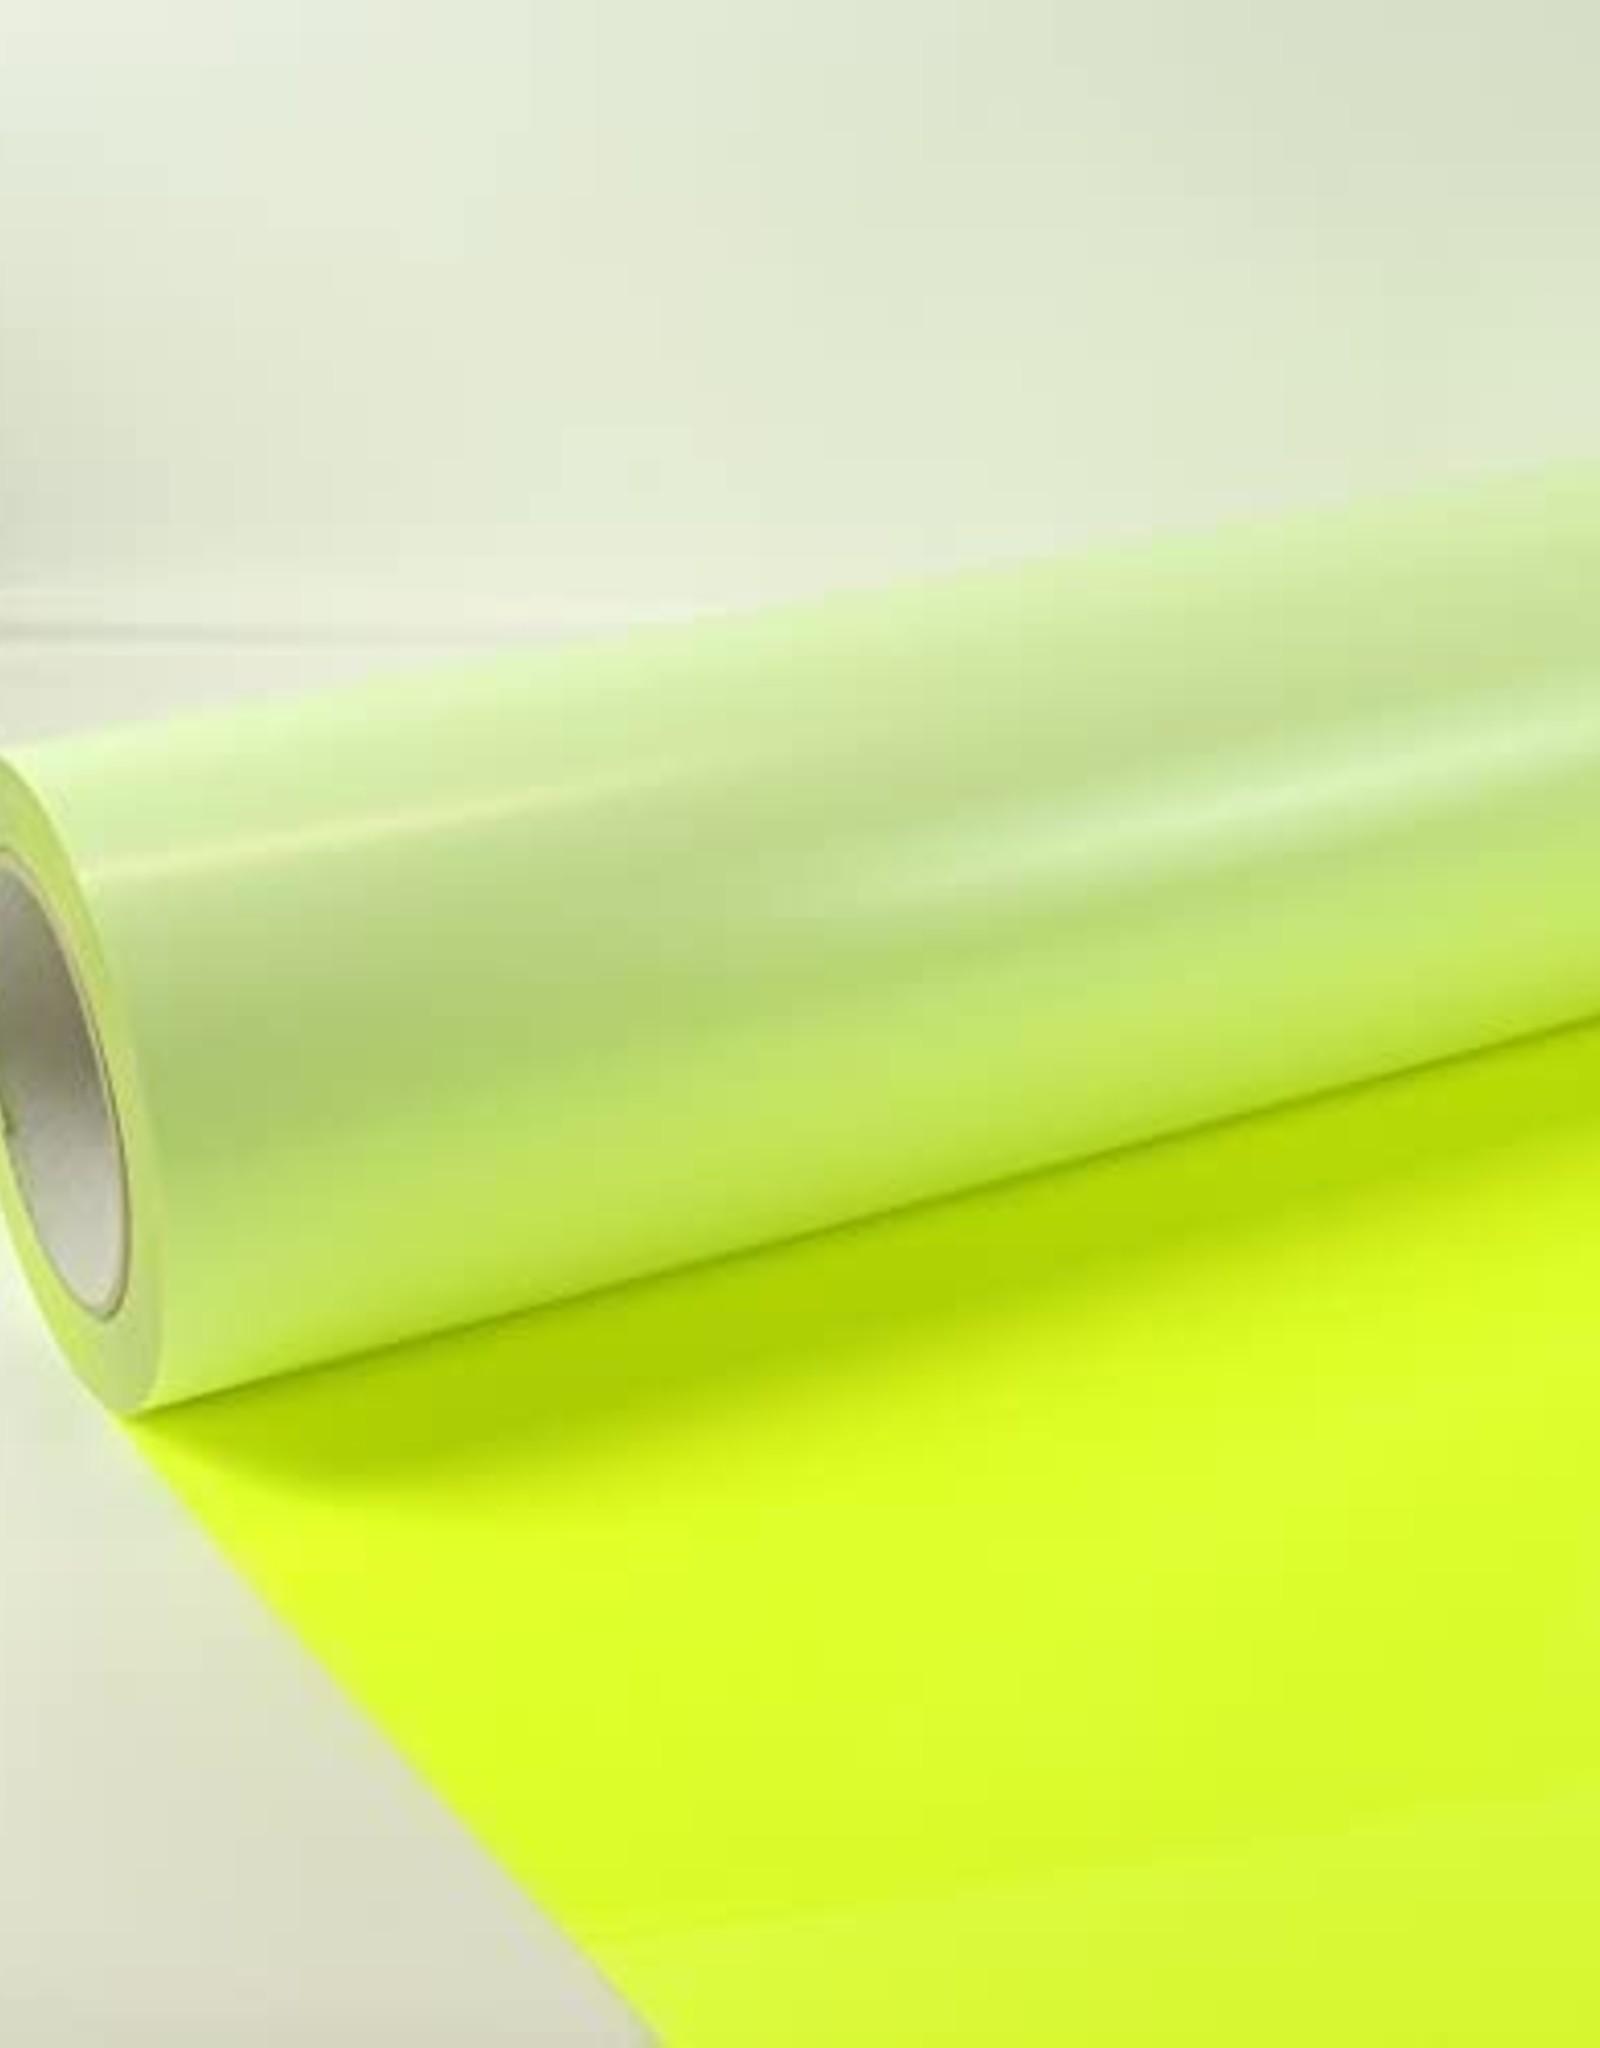 Siser Flexfolie  Neon fluor  geel 22 per 10cm